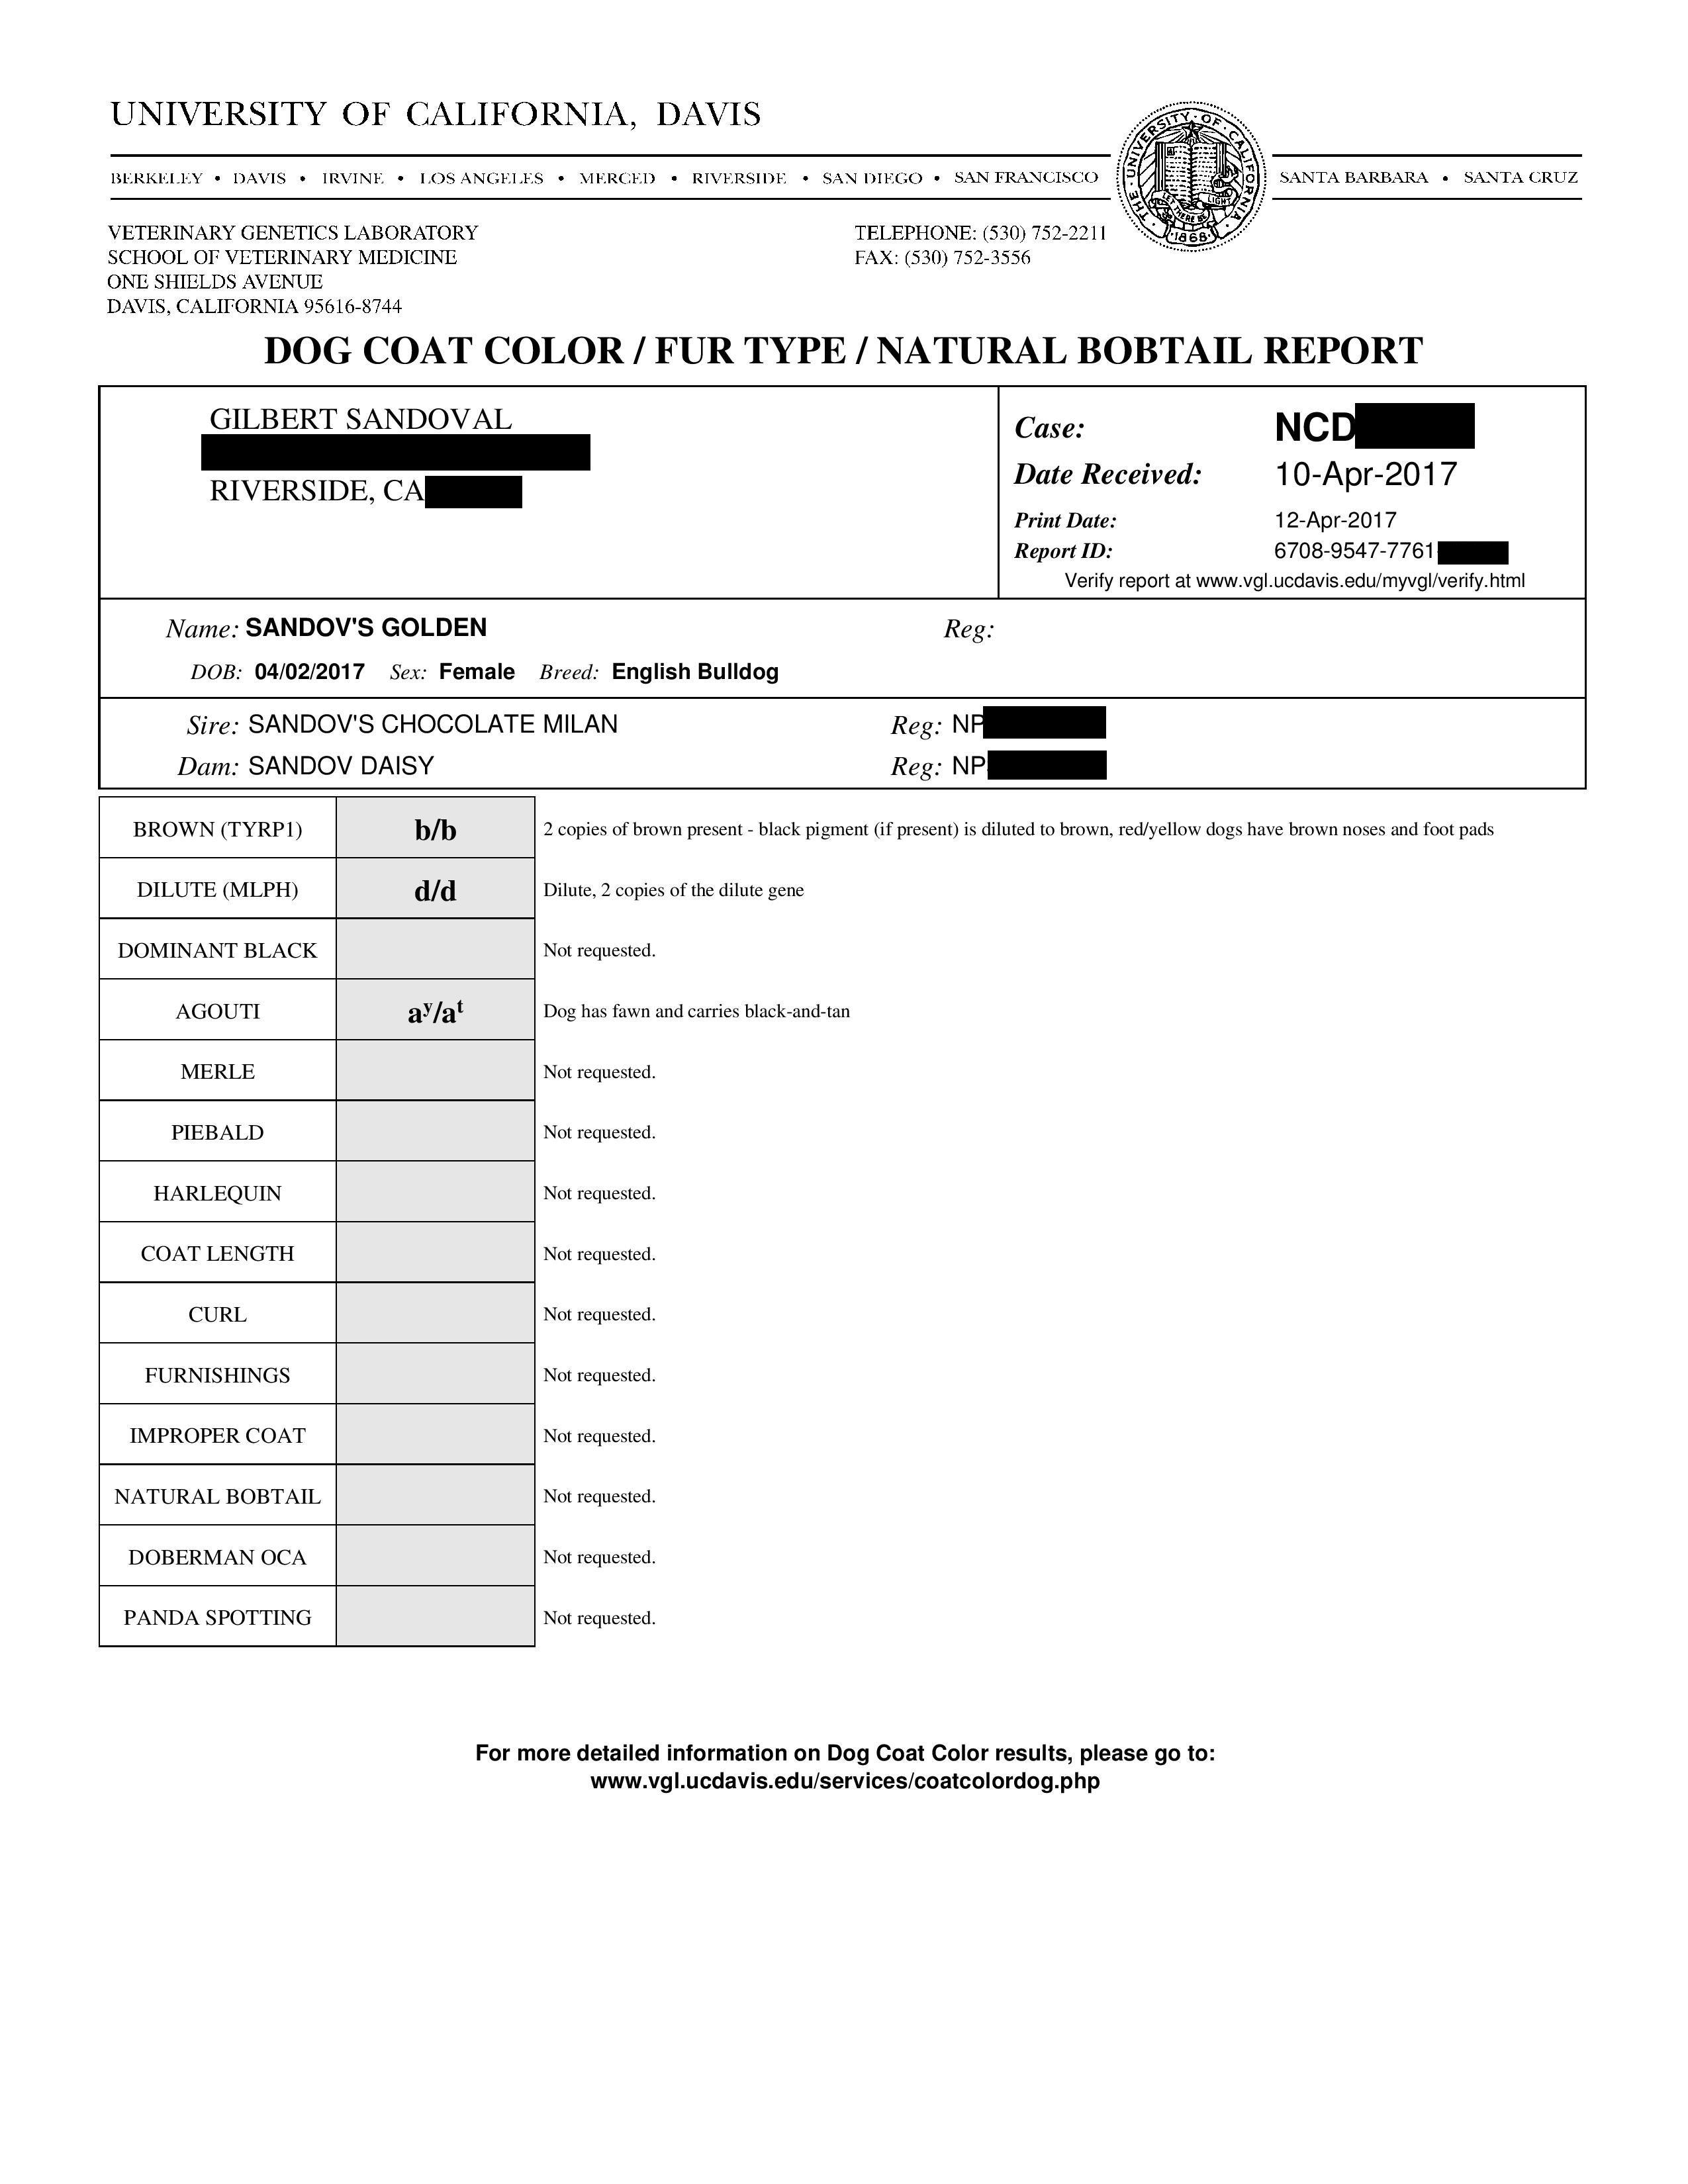 Test_DNA_Female4_041217